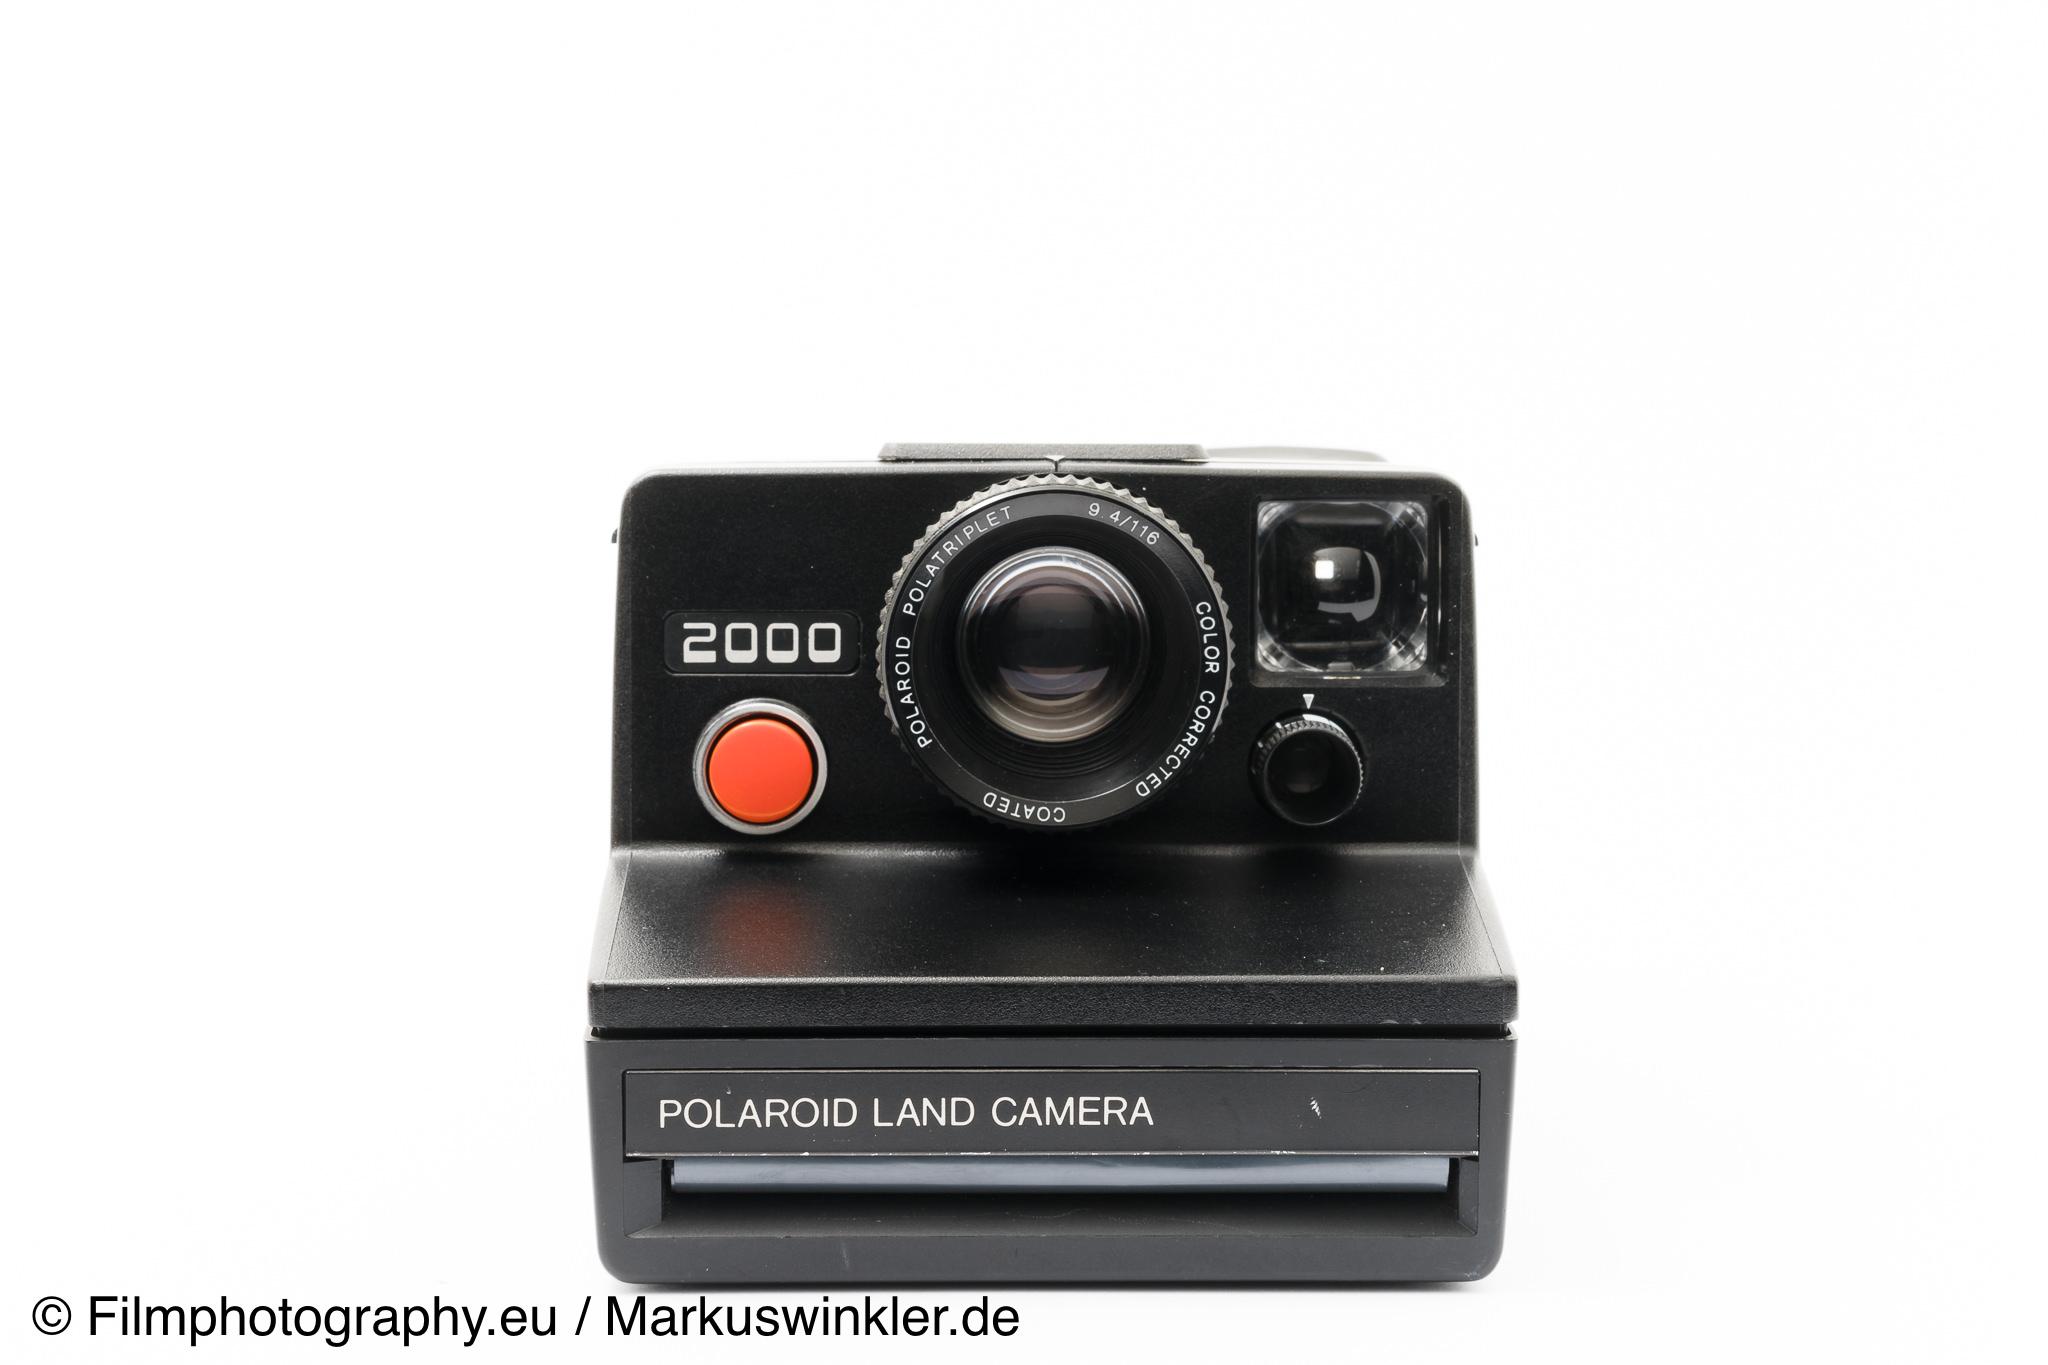 polaroid 2000 land camera sx 70 sofortbildkamera. Black Bedroom Furniture Sets. Home Design Ideas